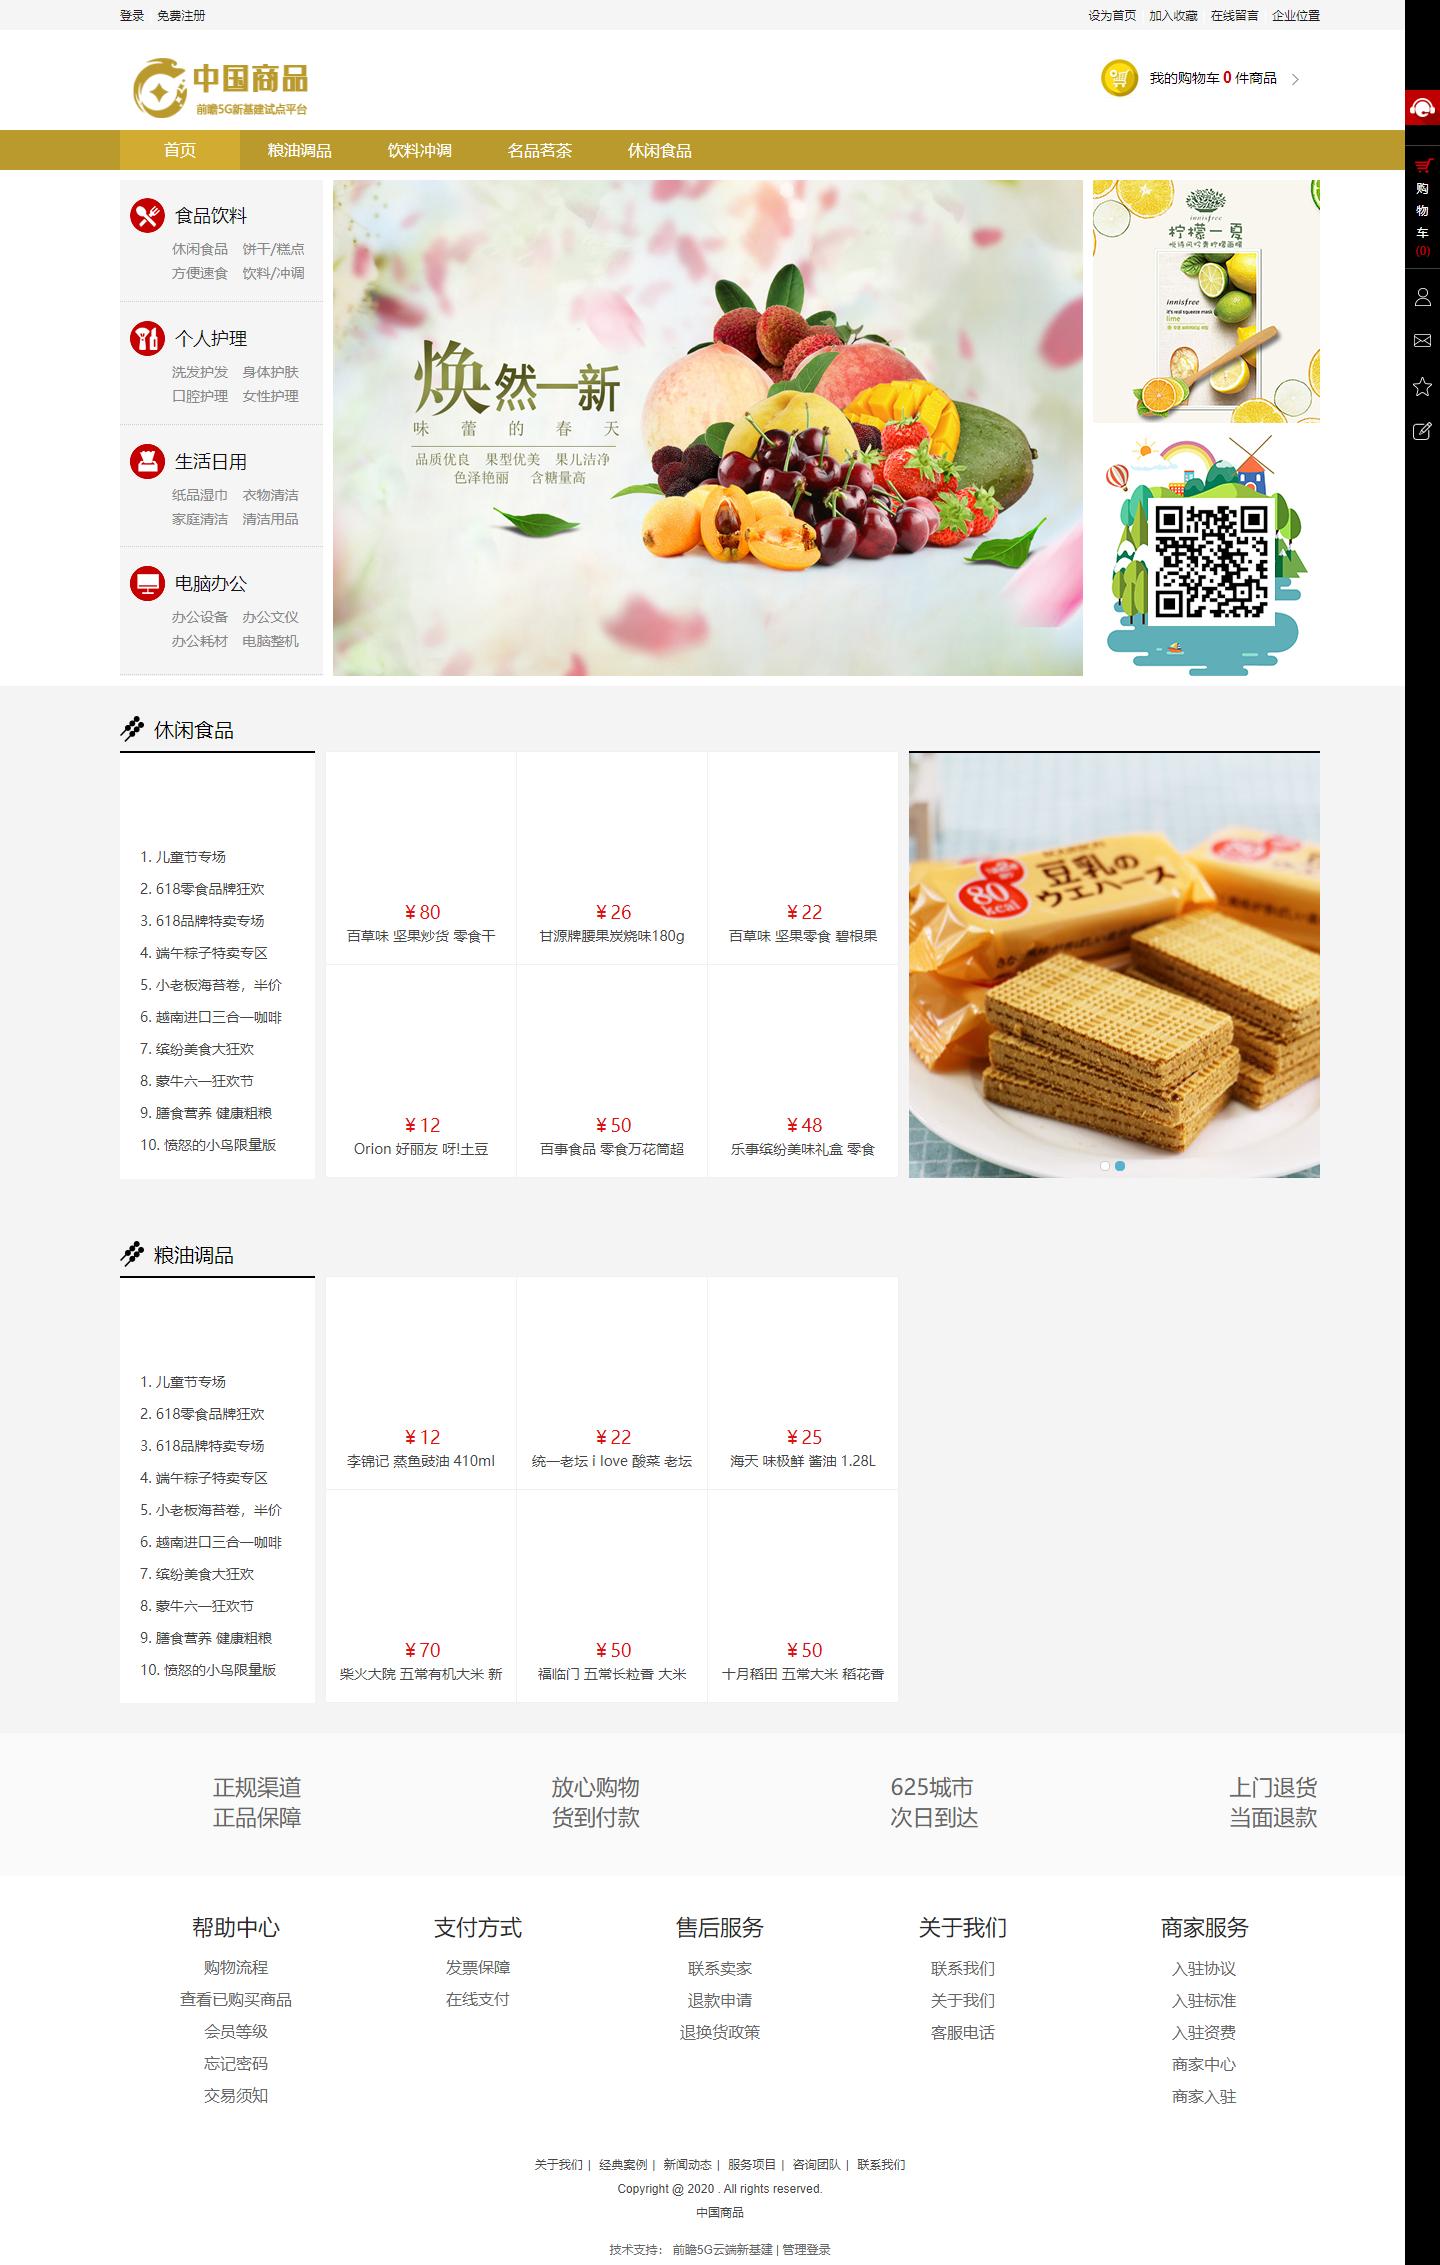 中国商品.png